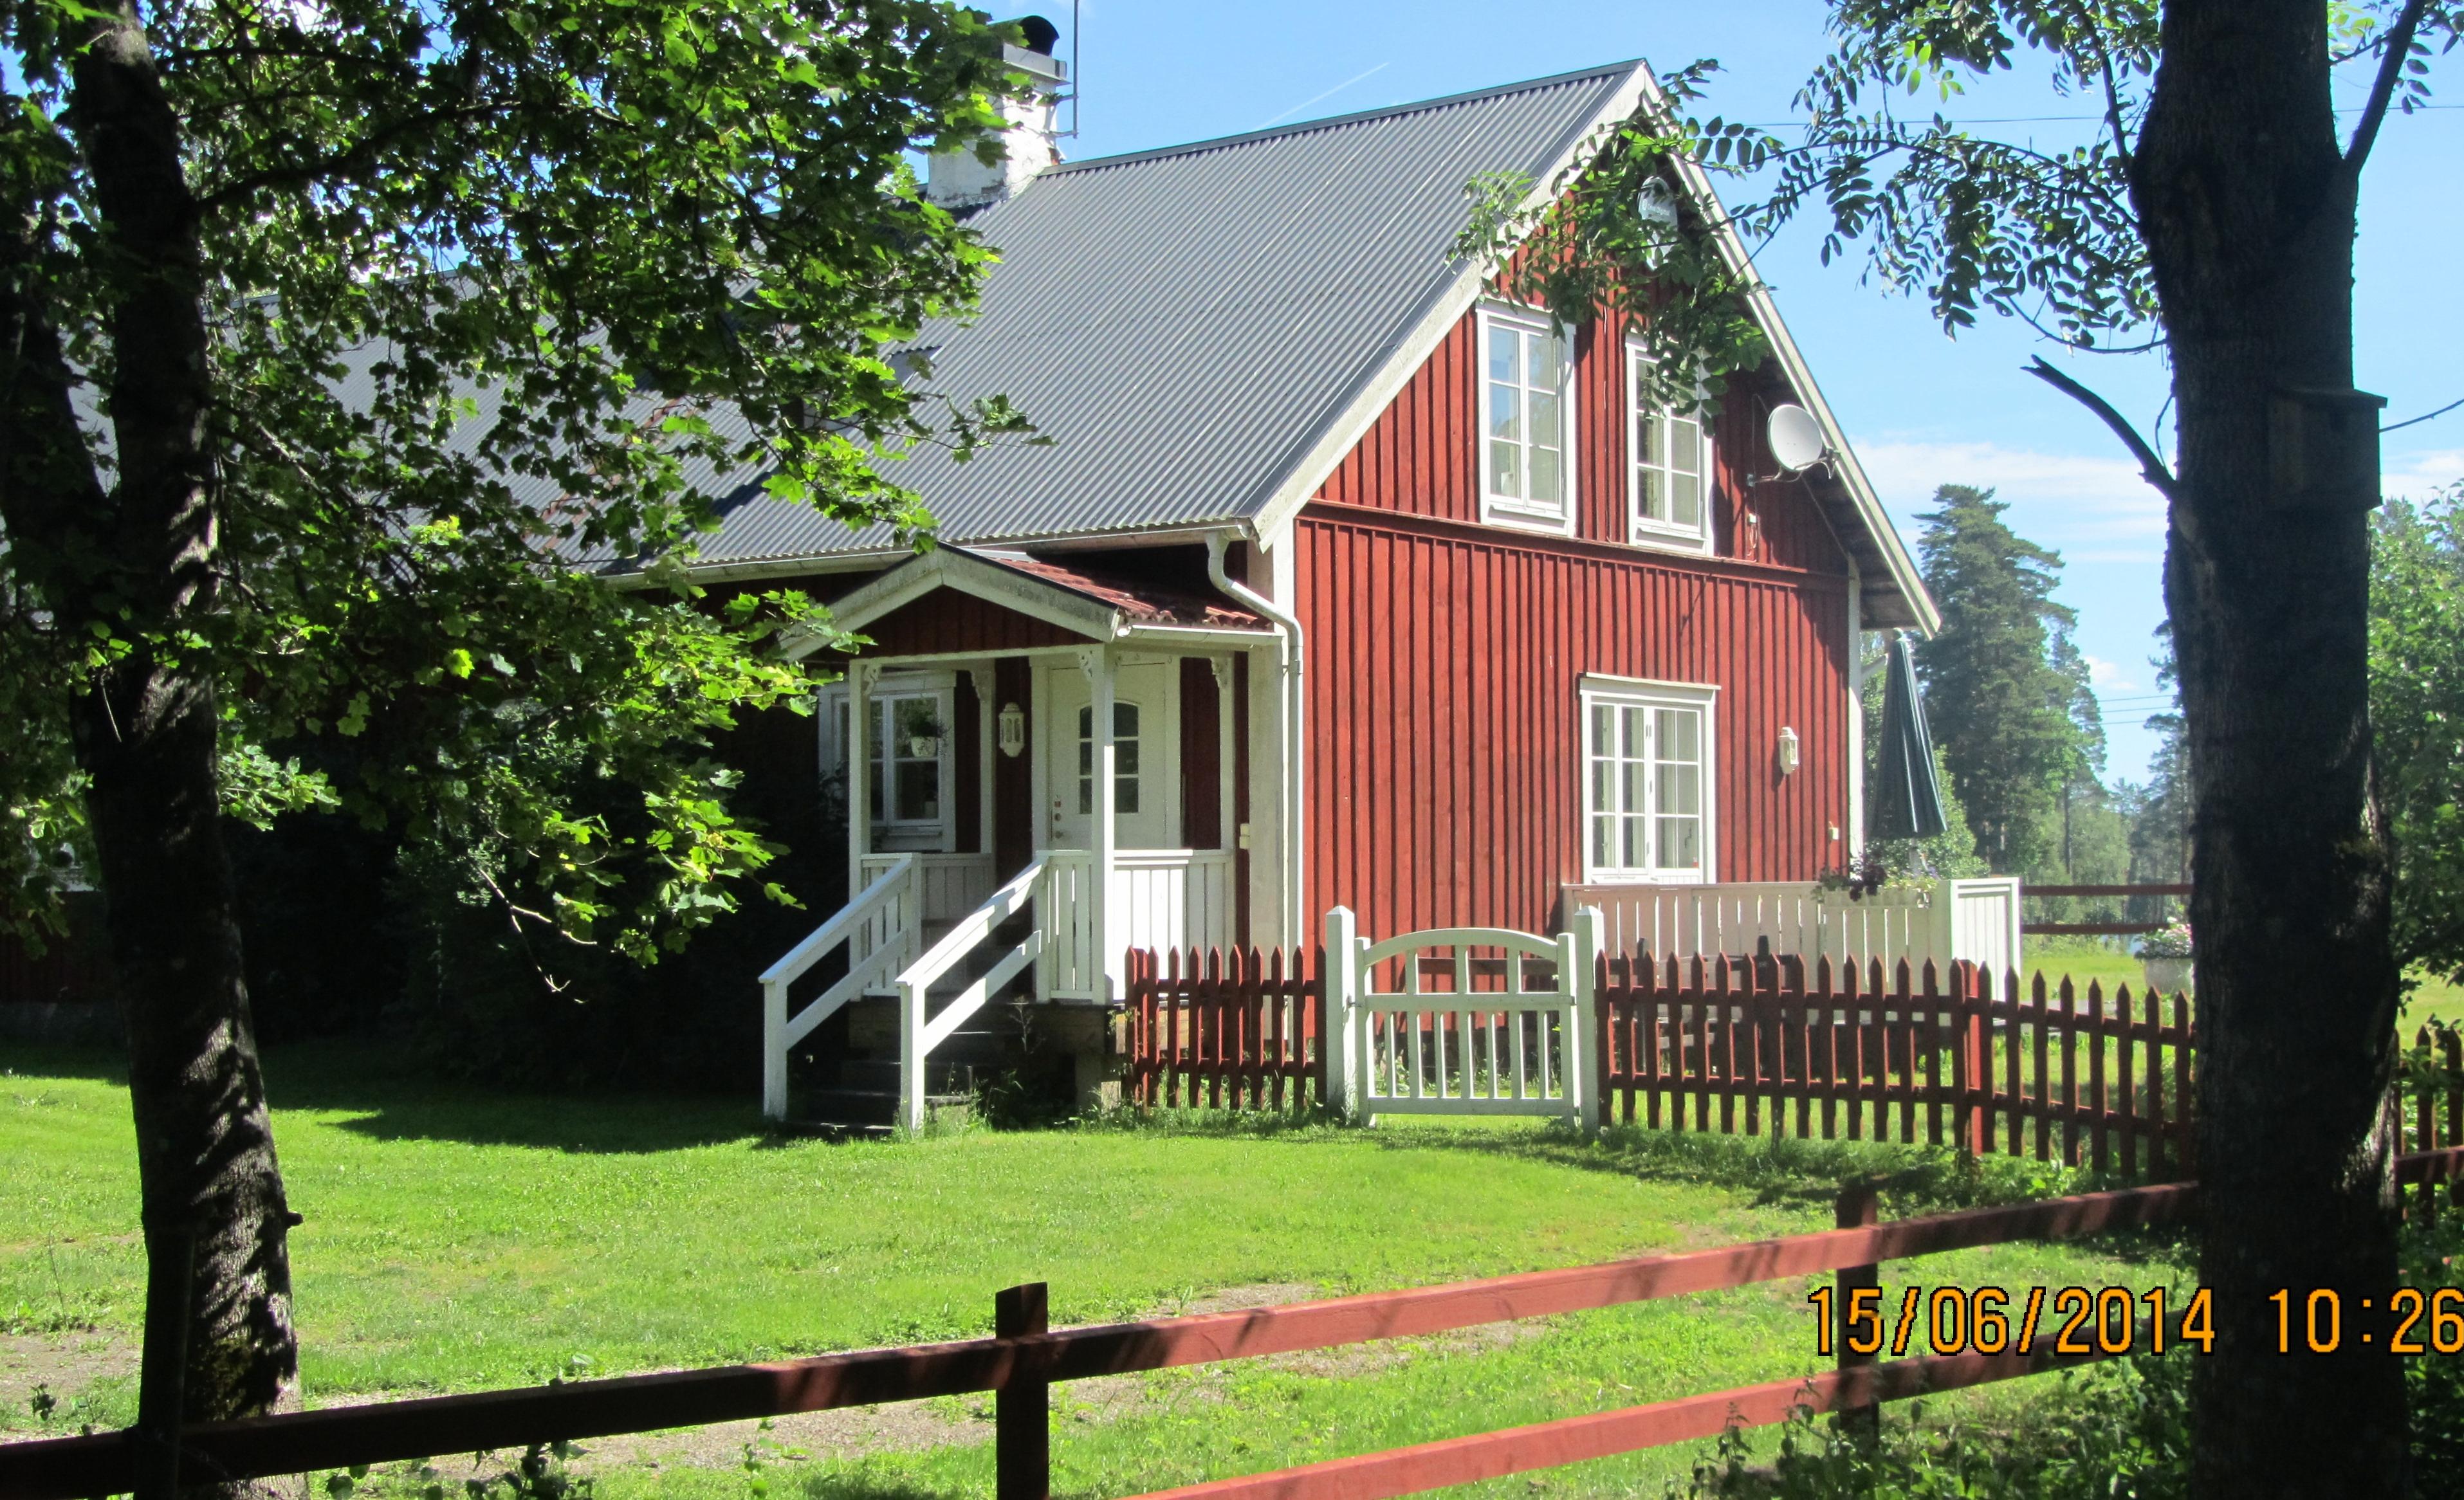 Svartarps gård